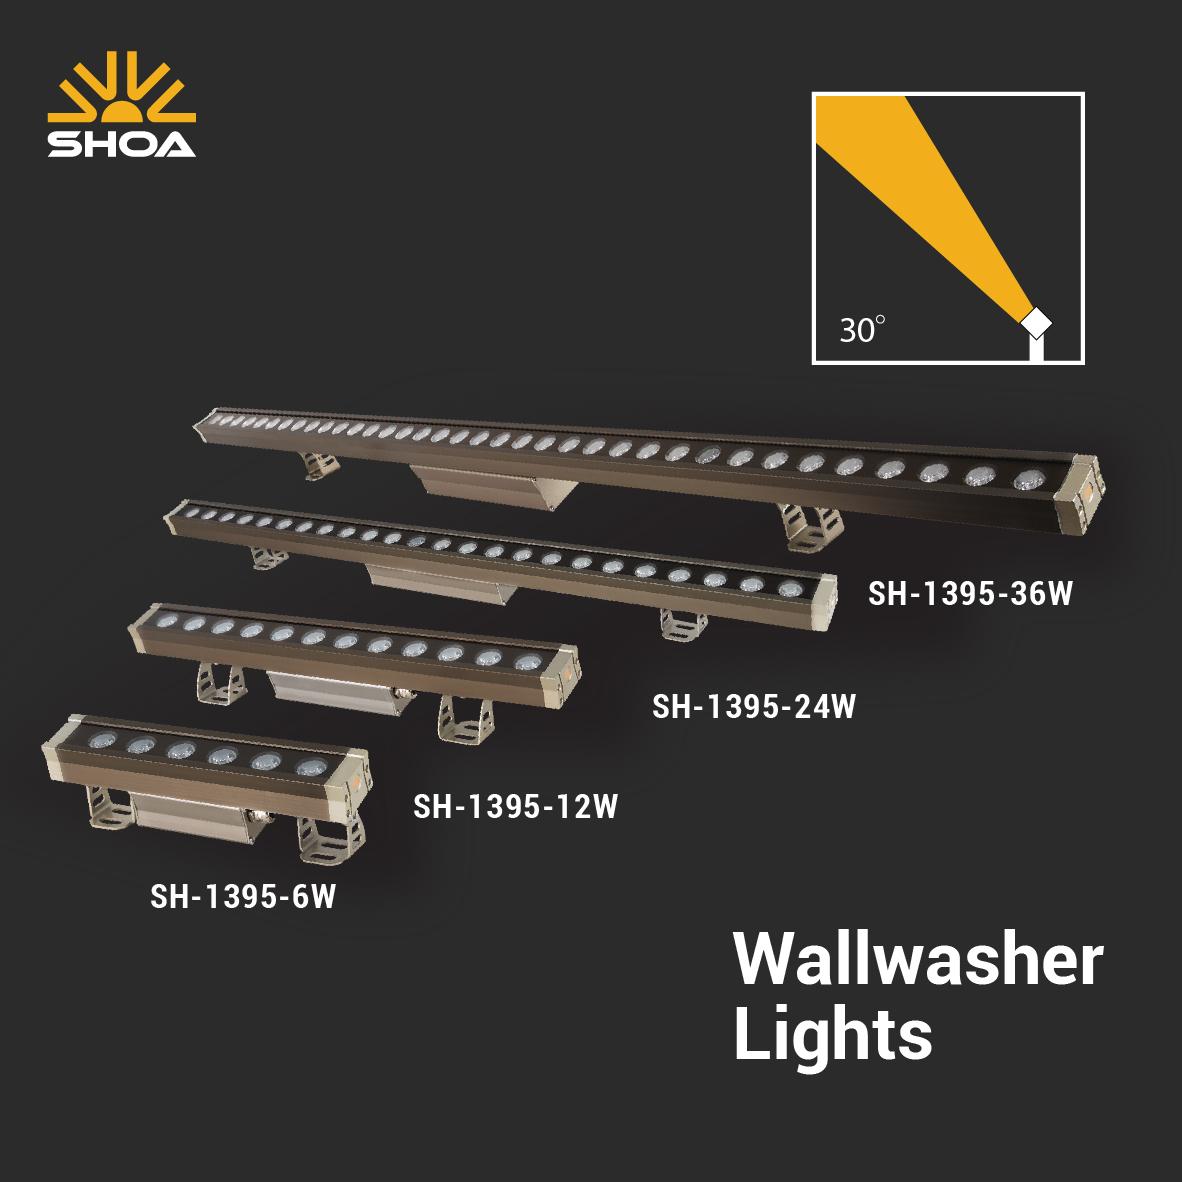 خرید چراغ وال واشر sh-1395-12LED